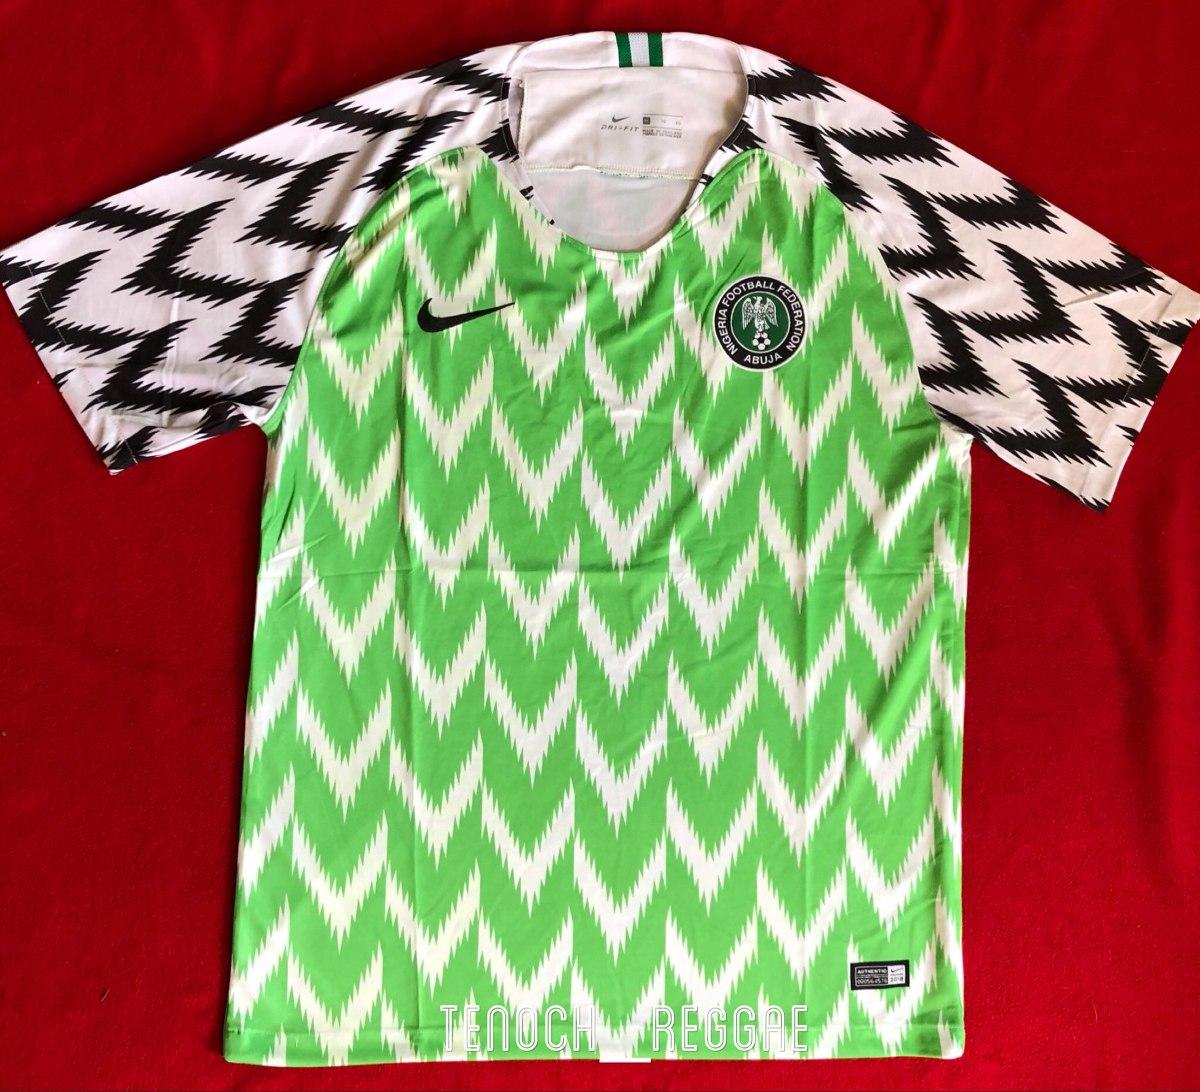 ... crazy price 53b9a a81c1 jersey playera selección nigeria 2018 local  envió gratis. Cargando zoom. ... 8f76b5b609691